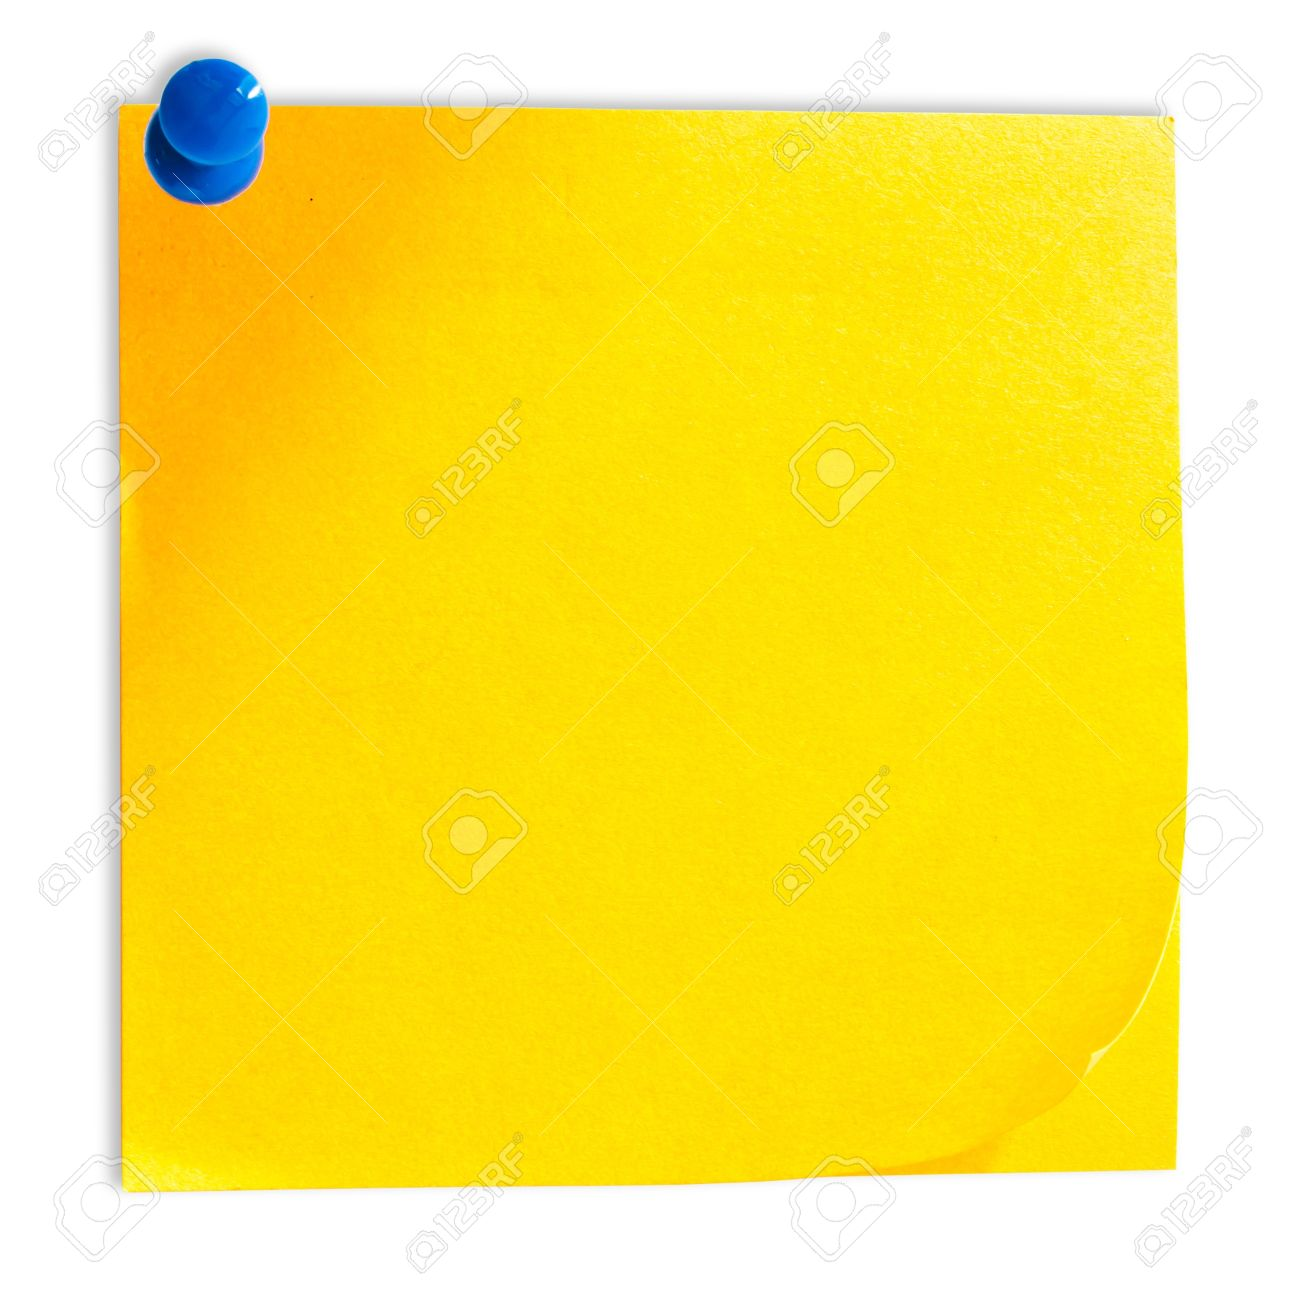 Yellow Memo Stick Isolated On White Background Stock Photo 1300x1300